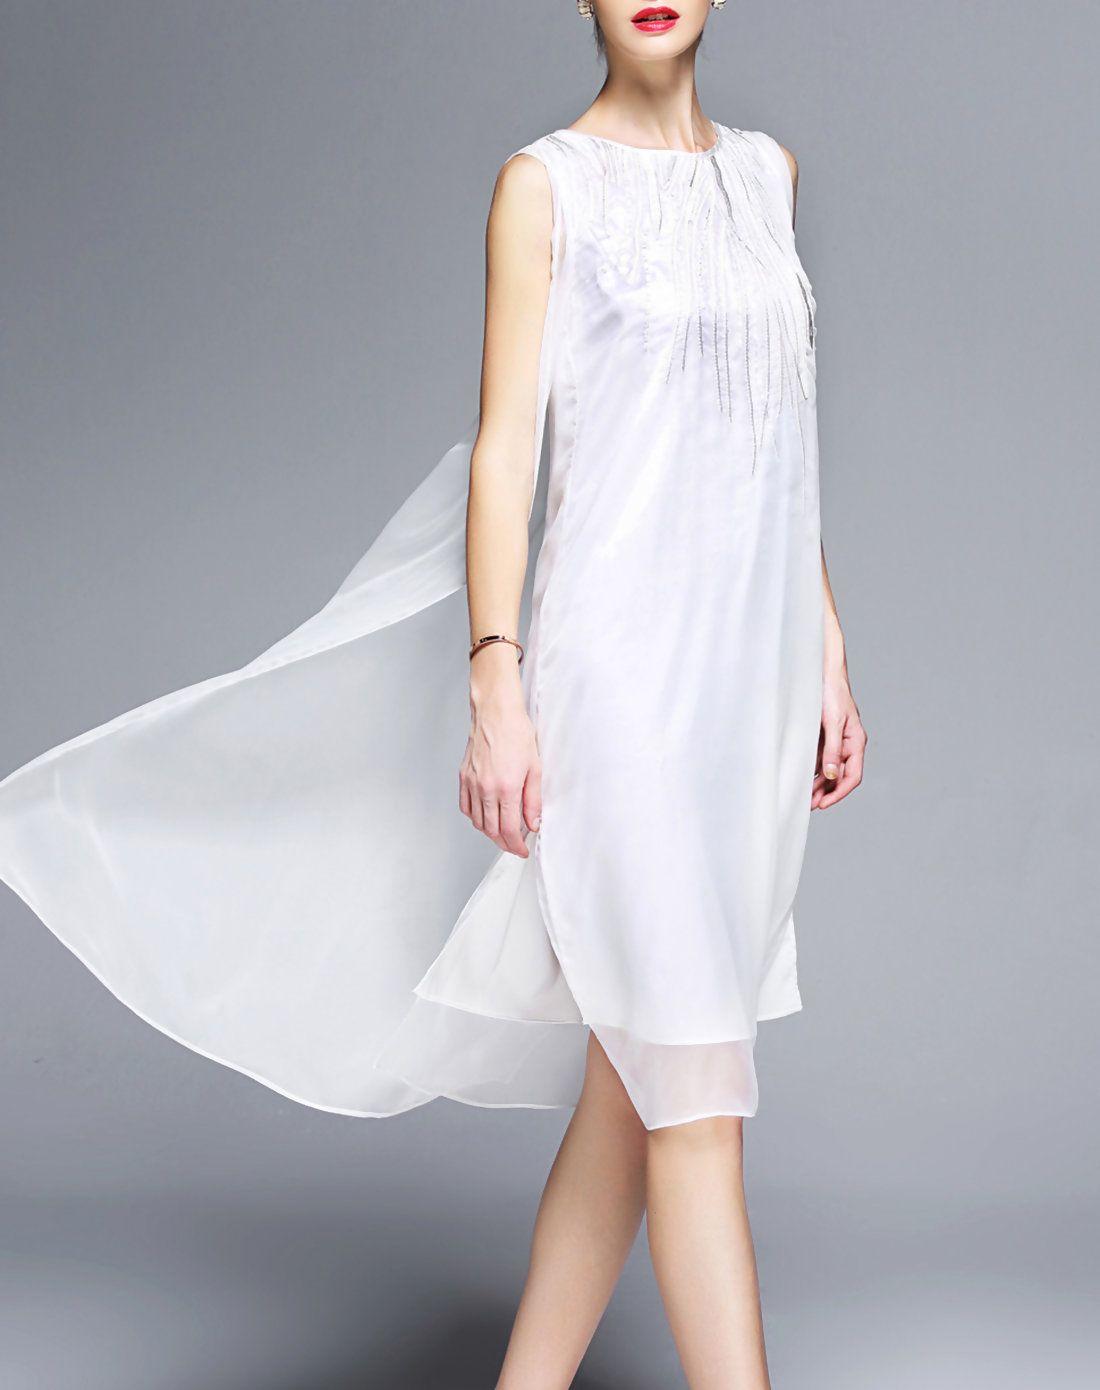 AdoreWe VIPme Shift Dresses GYALWANA White Chiffon Sleeveless